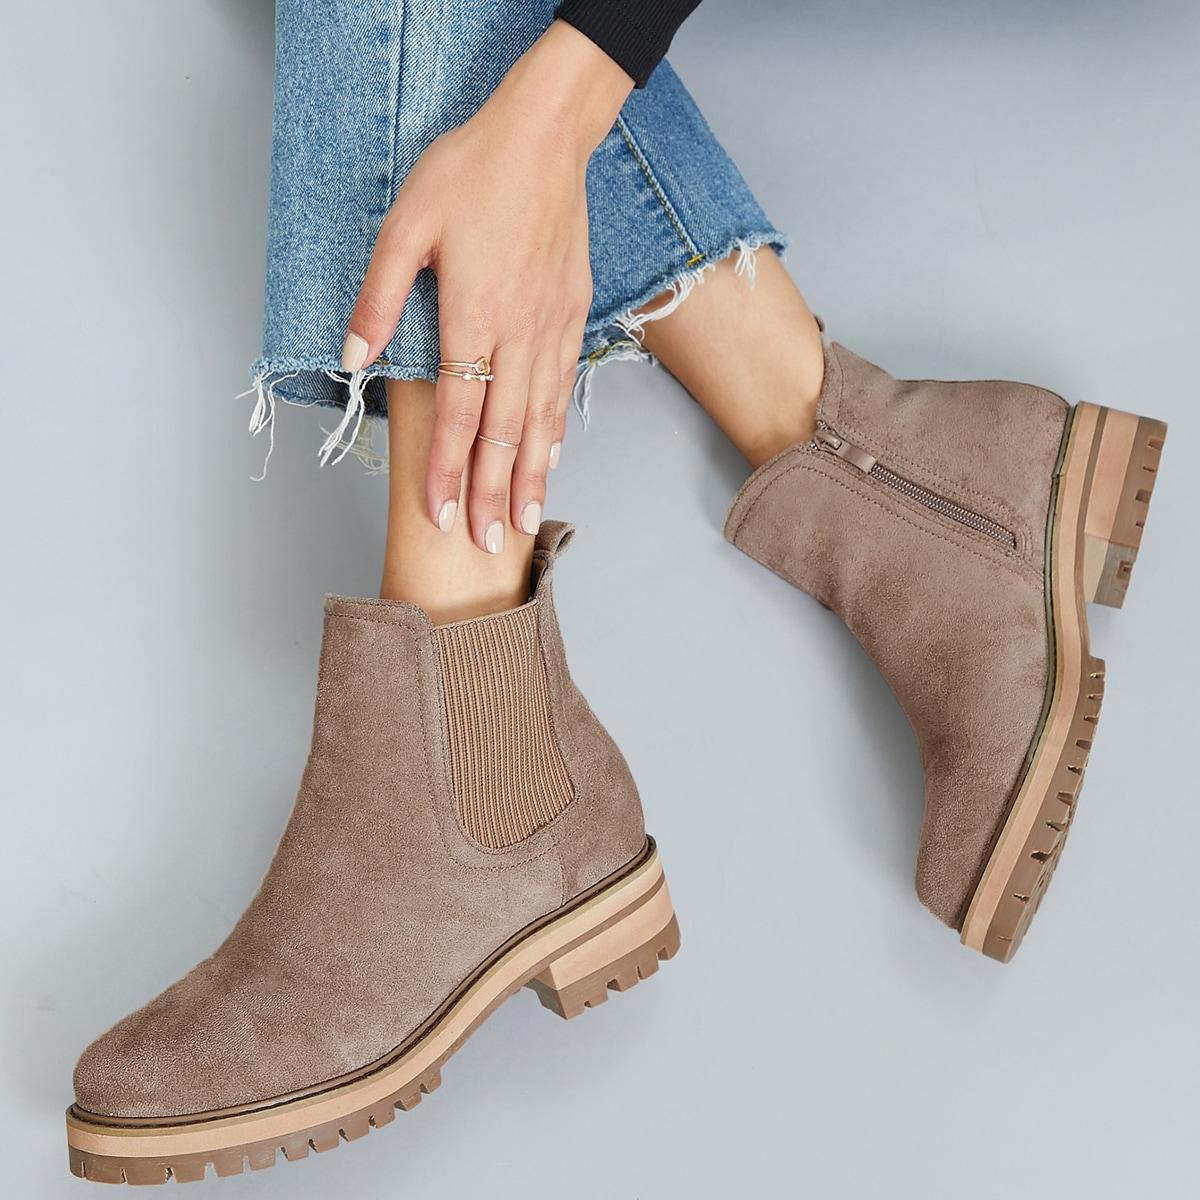 Замшевые сапоги с низким каблуком